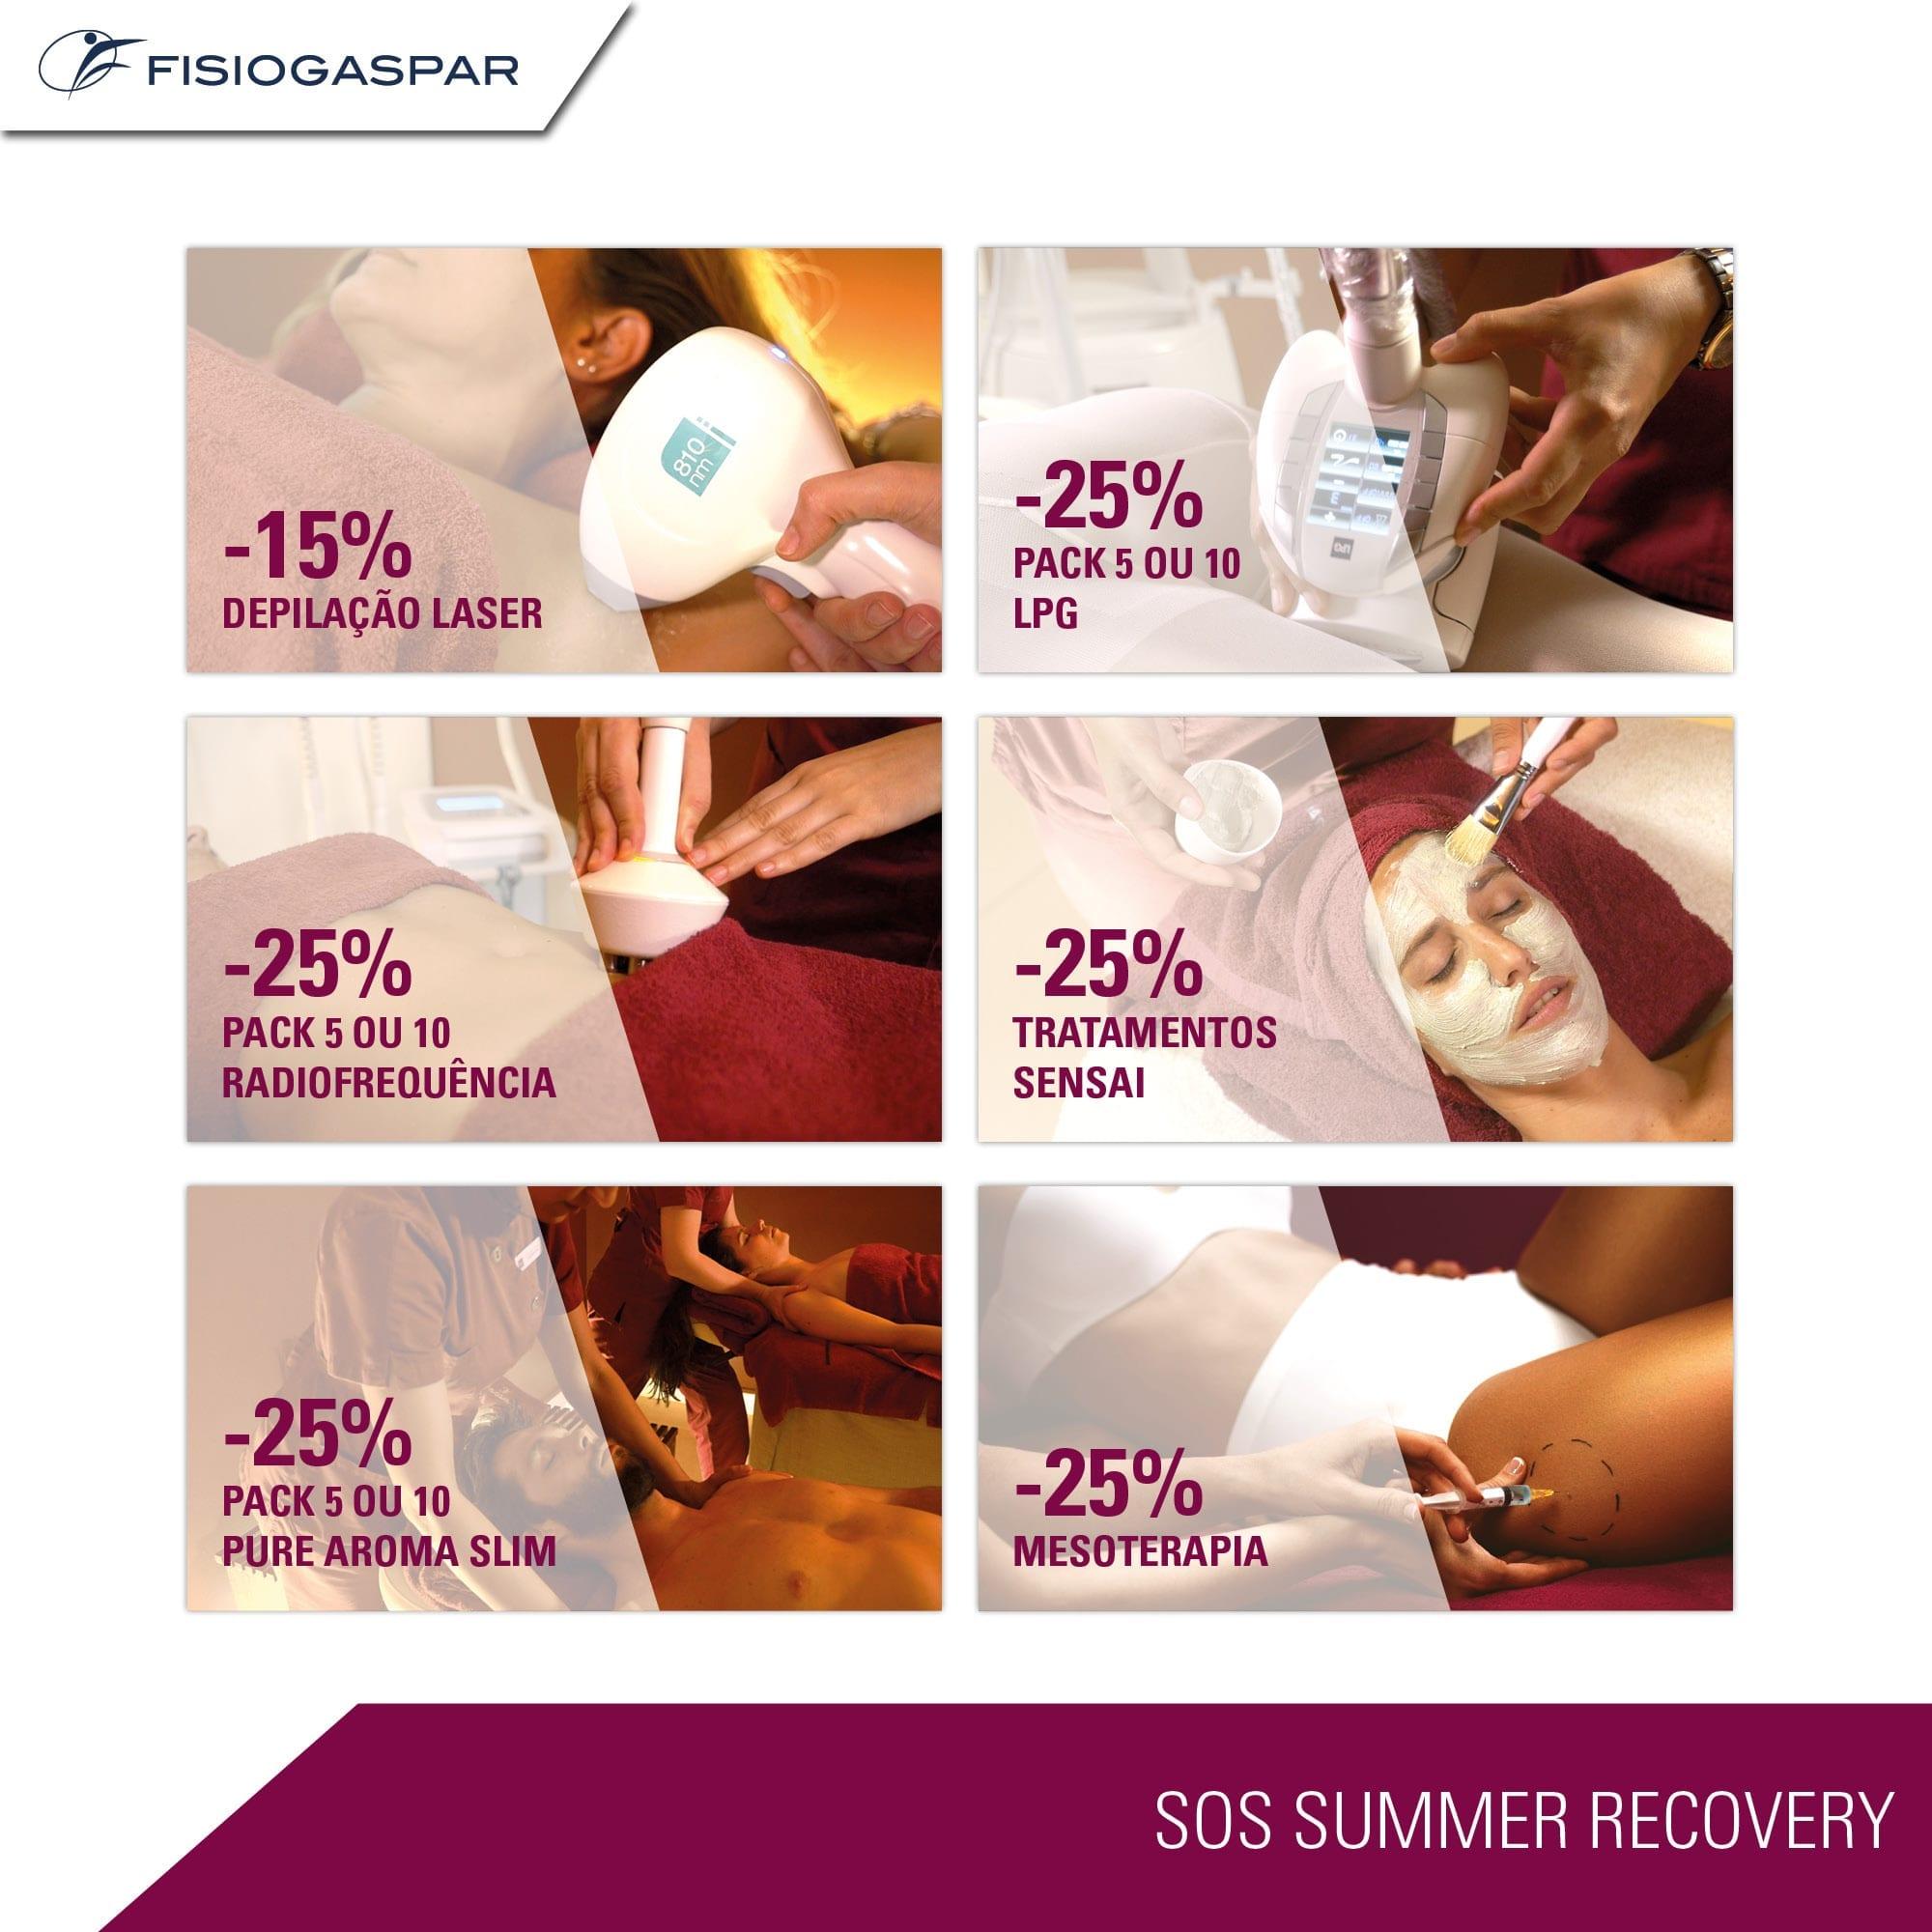 SOS summer recovery tratamentos